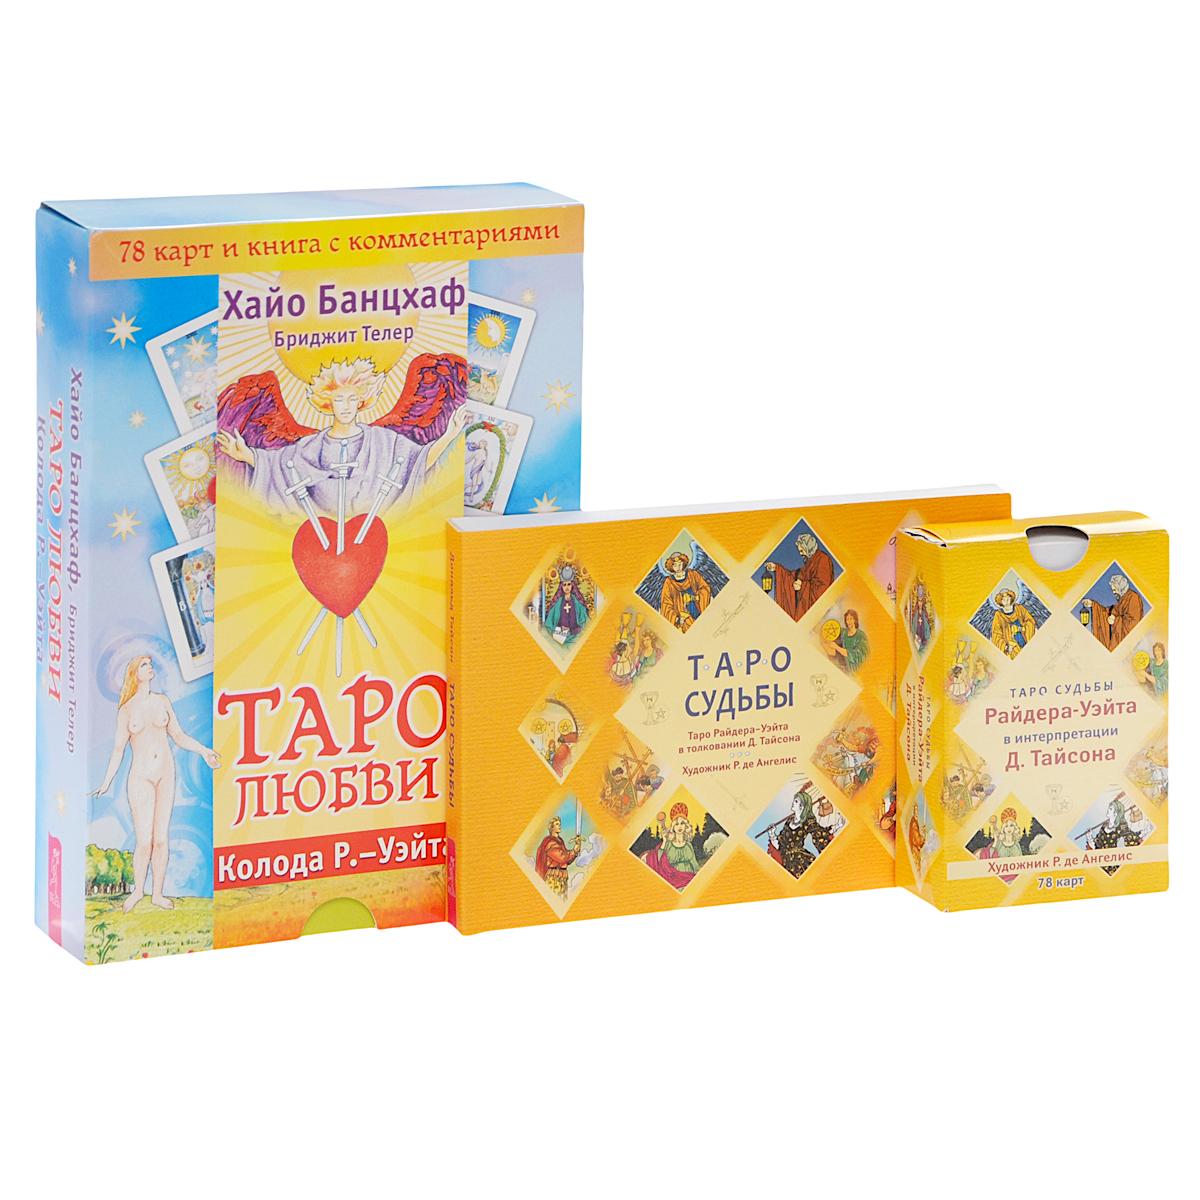 Таро любви (книга + набор из 78 карт). Таро судьбы. Таро судьбы (набор из 78 карт) (комплект). Алена Солодилова (Преображенская), Хайо Банцхаф, Бриджит Телер